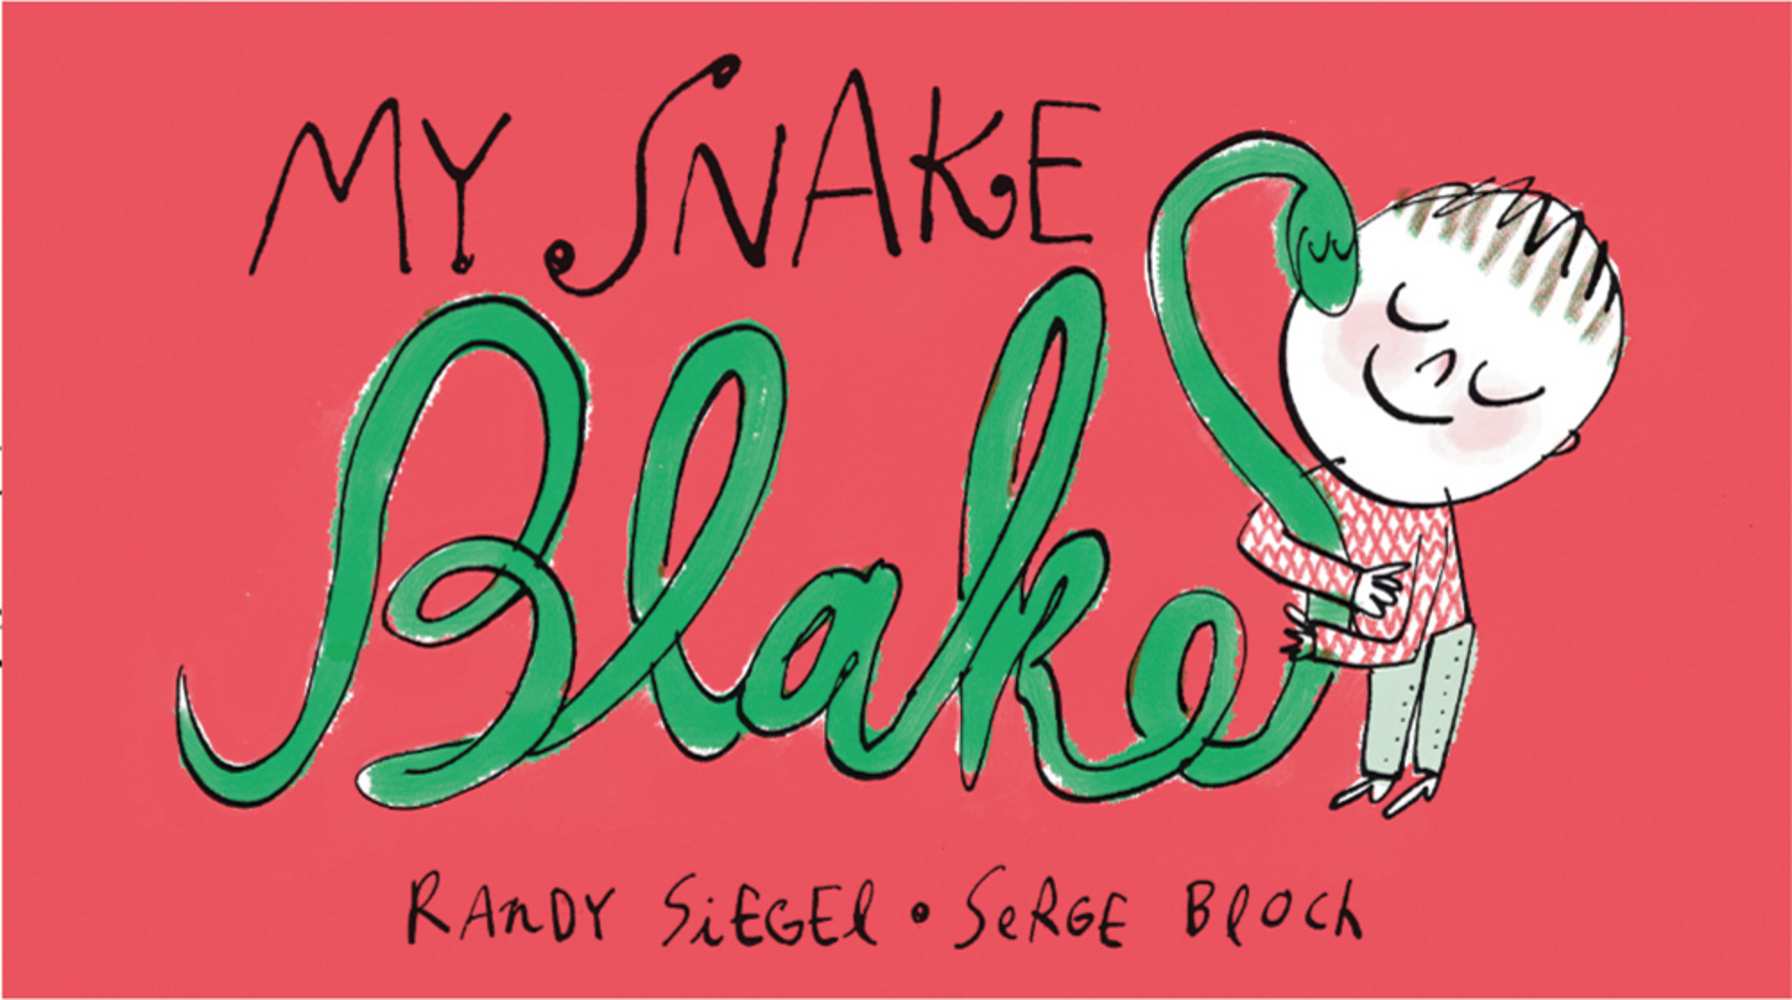 My Snake Blake by Randy Siegel